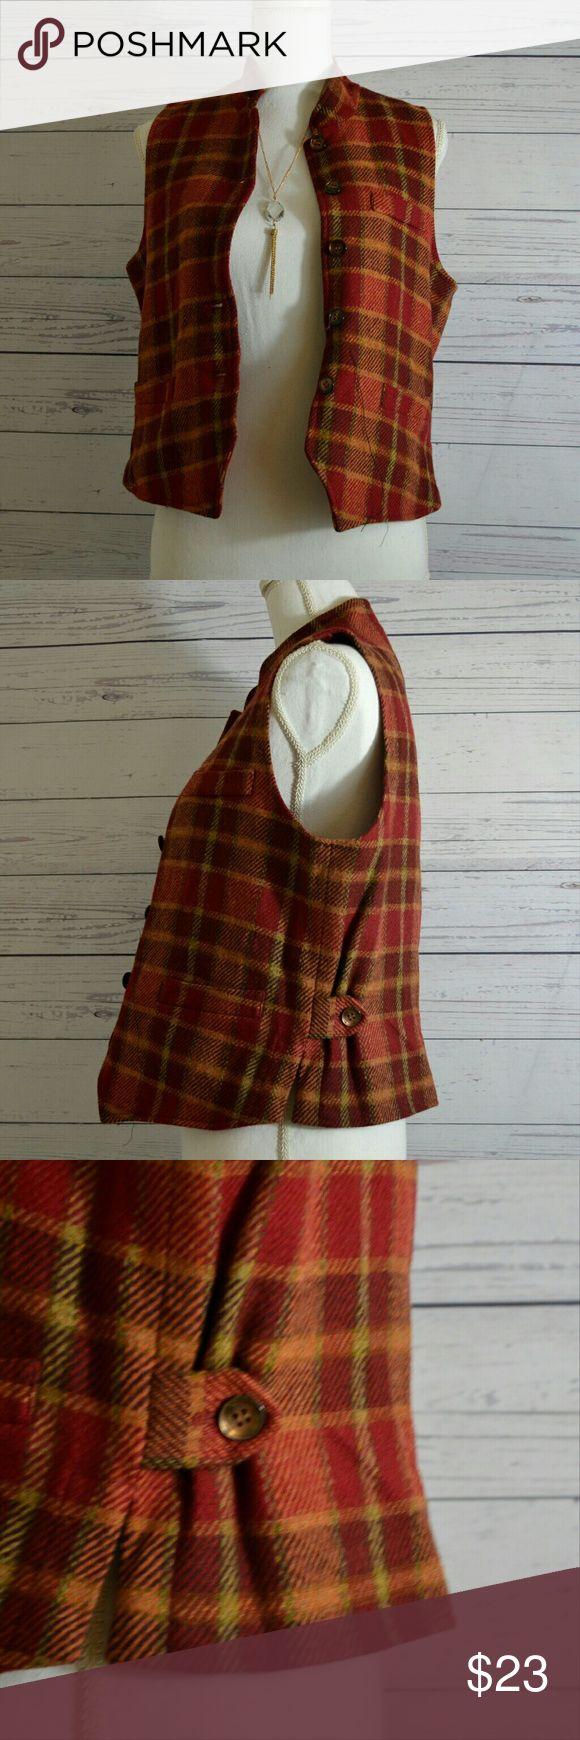 Cambridge dry goods Women's vest size small Pre loved women's plaid orange Burgundy box stripes vintage vest.  Size small Cambridge Dry Goods Jackets & Coats Vests